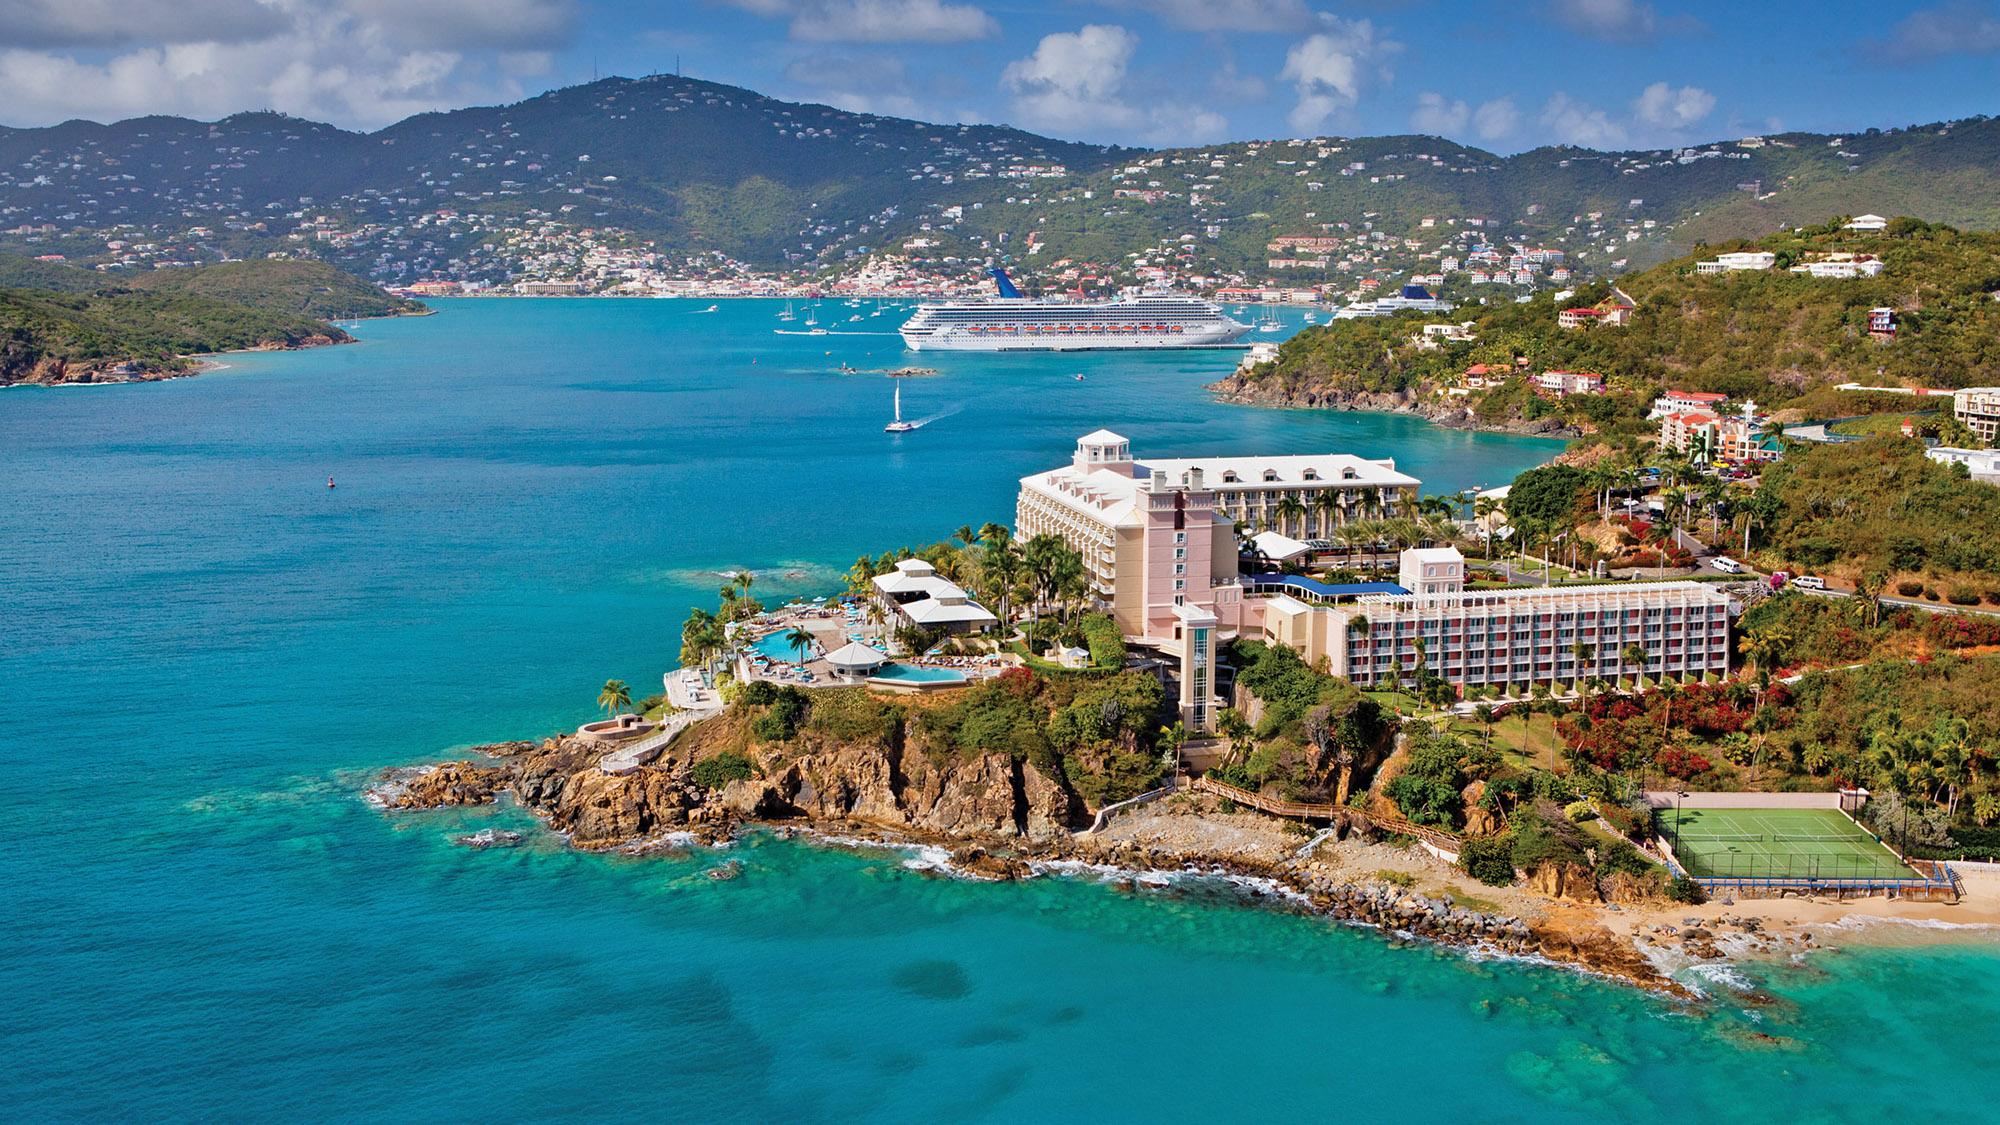 The Frenchman S Reef Morning Star Marriott Beach Resort Before Hurricane Irma